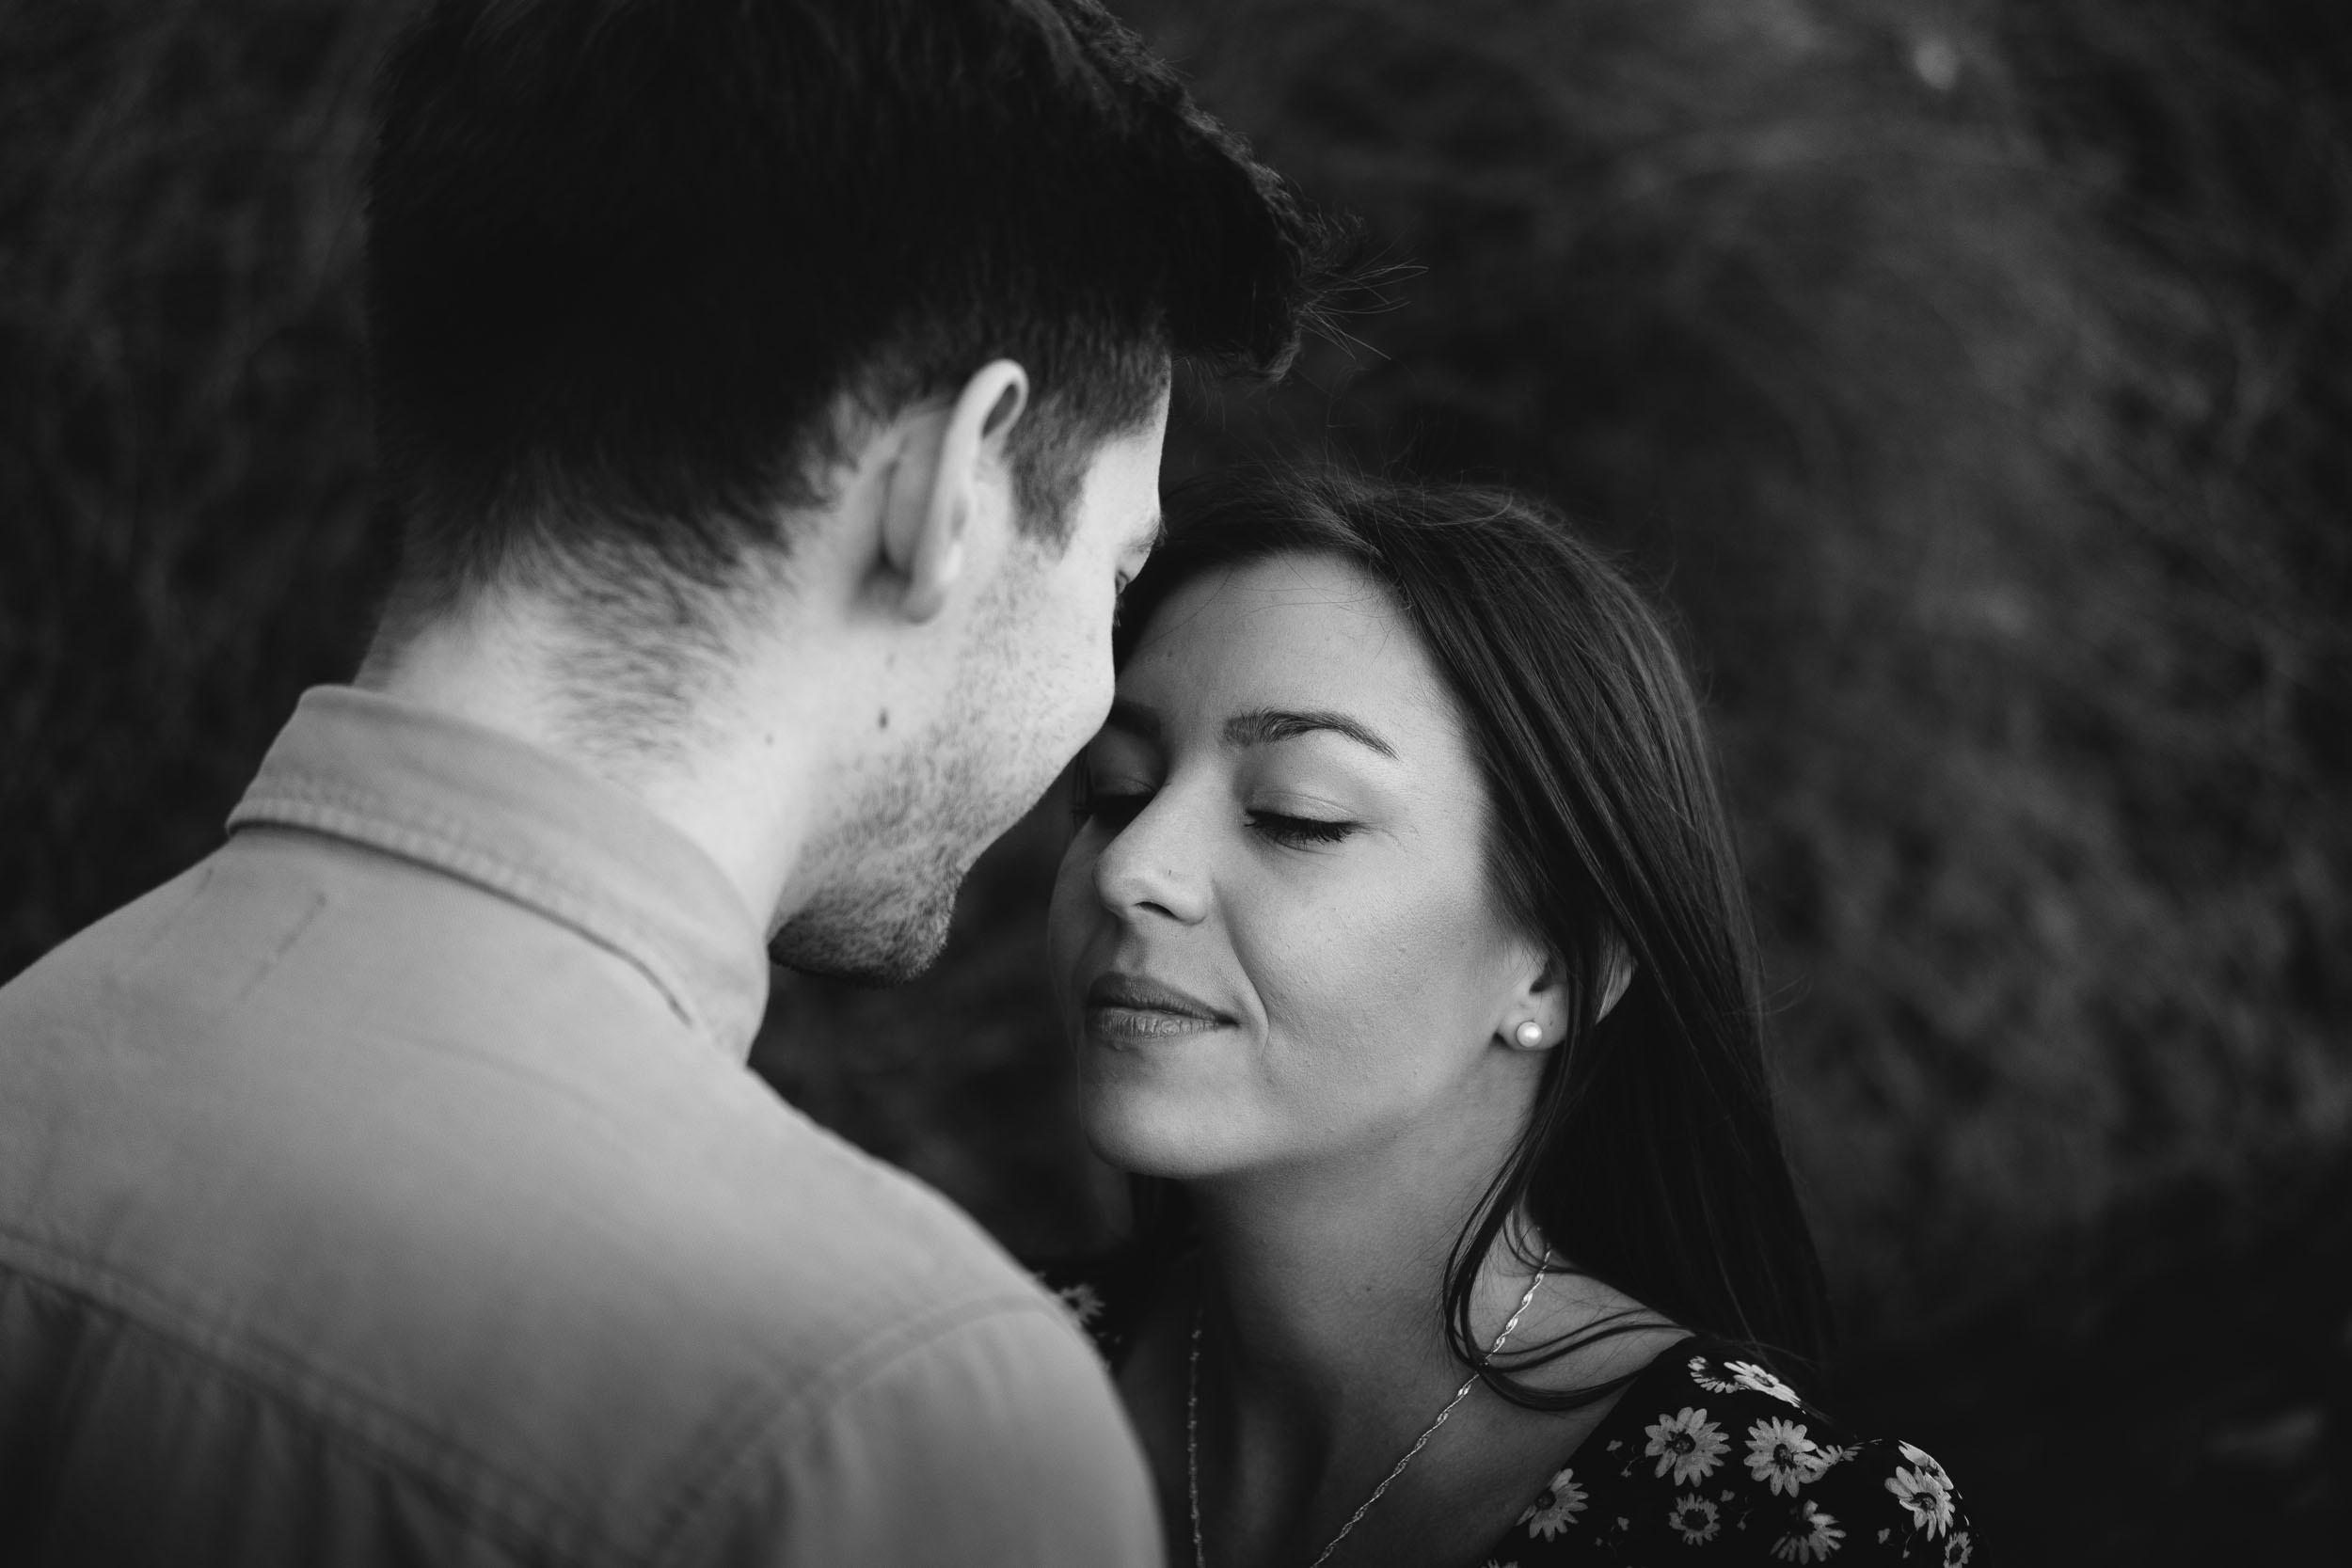 Black and white photo of engaged couple embracing